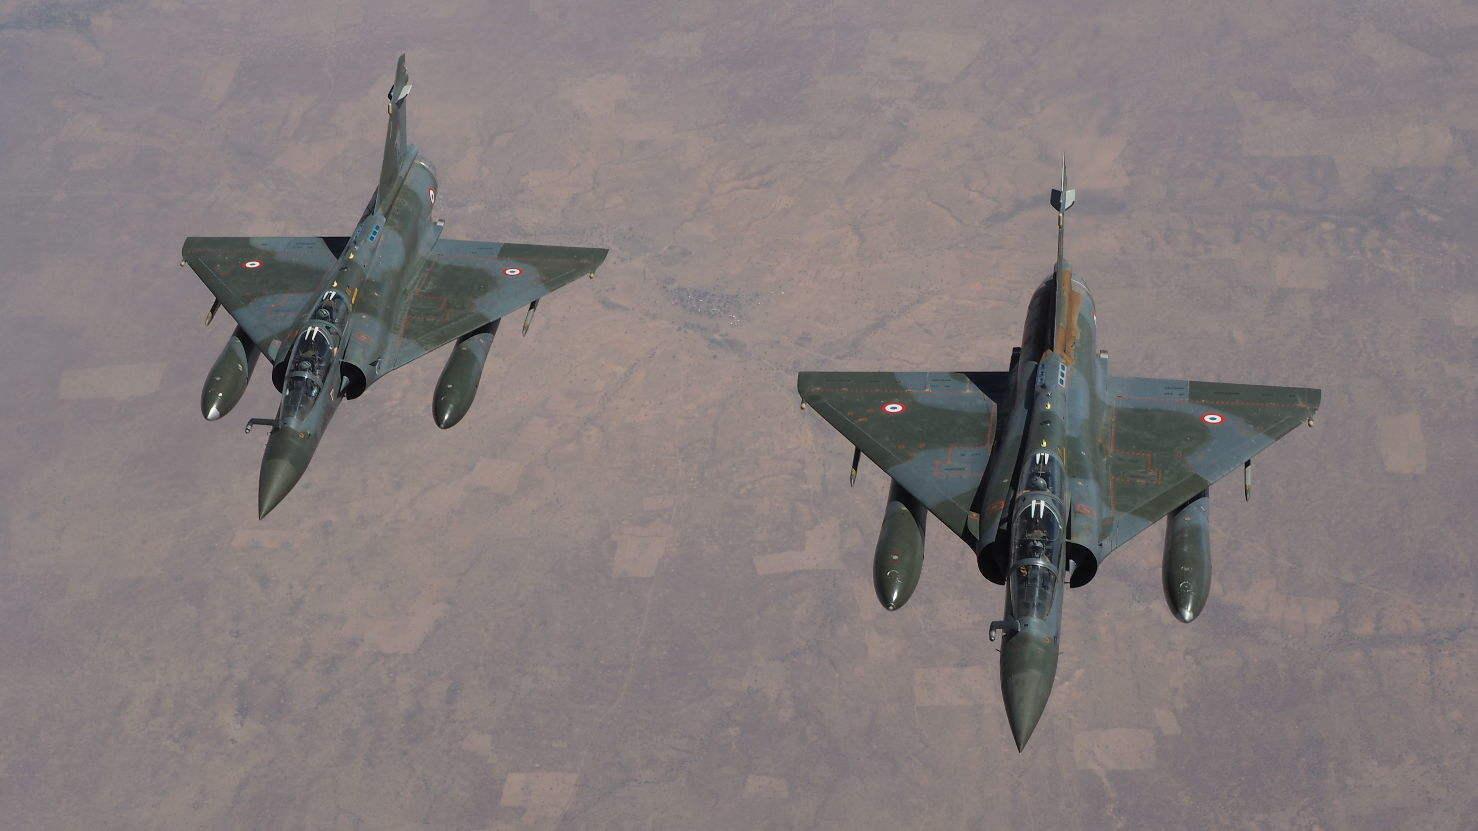 French AF releases Chammal, Barkhane data